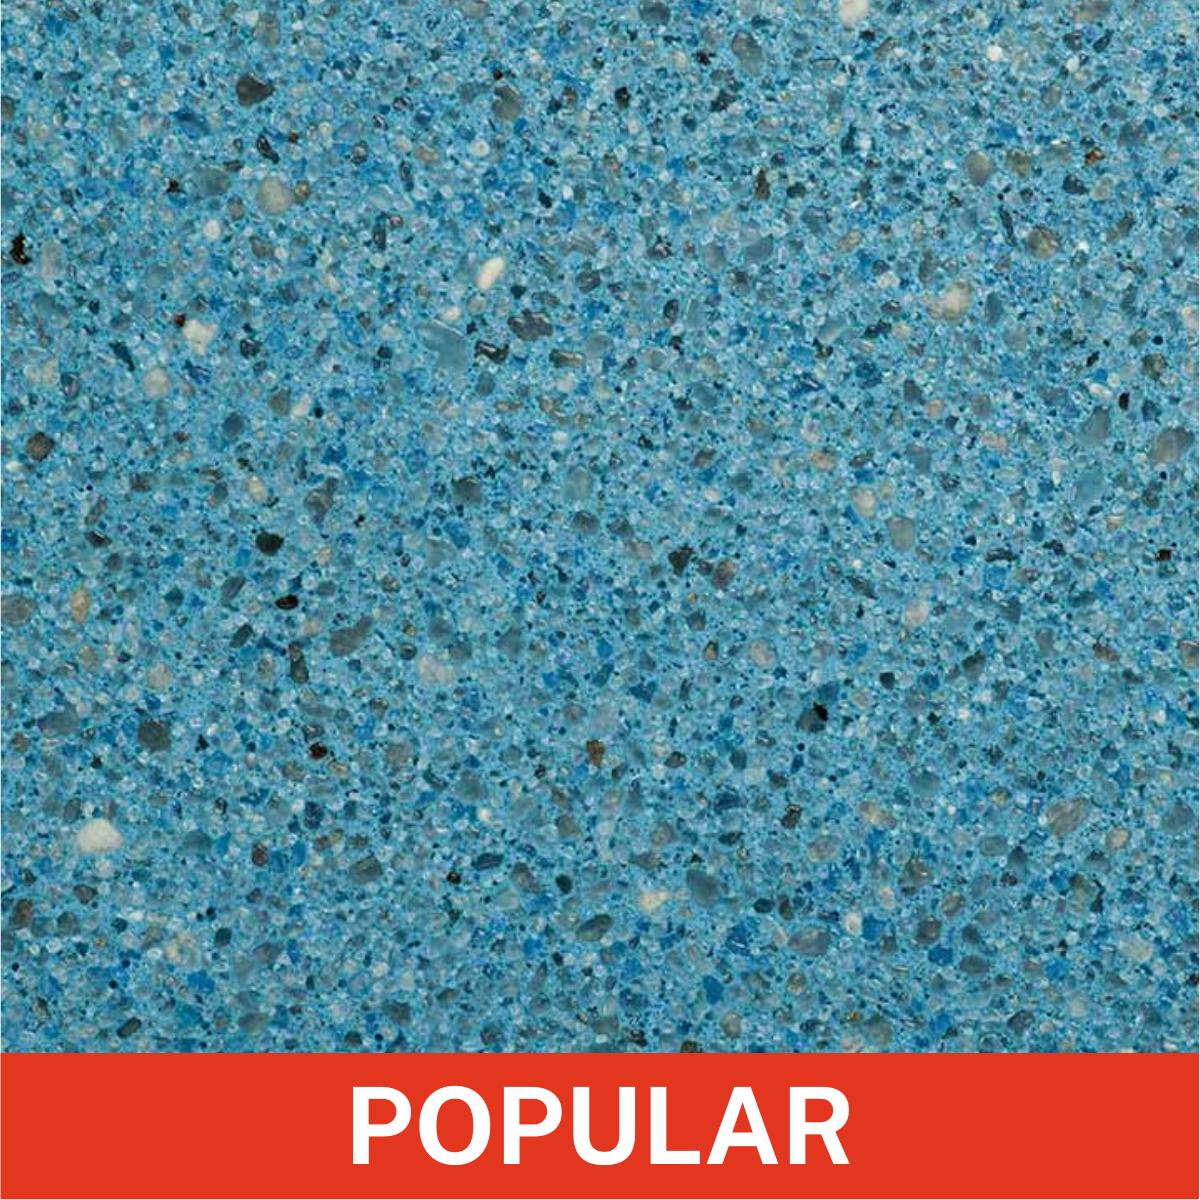 Florida Stucco - Azure Plaster Cement Finish Close Up (Popular)